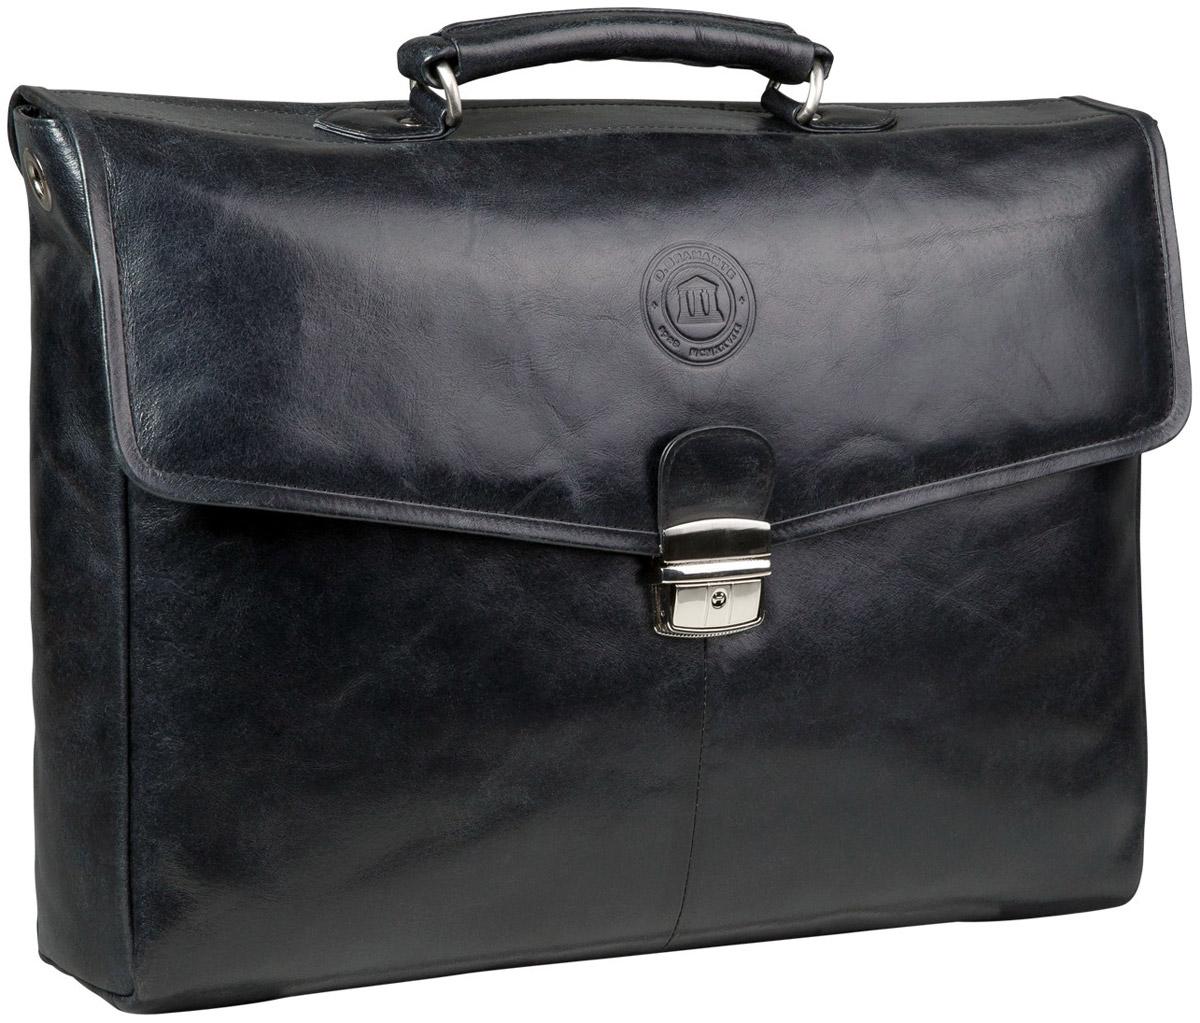 Dbramante1928 Frederiksborg Briefcase, Black сумка для ноутбука 14 (BG14GTBL0523)BG14GTBL0523